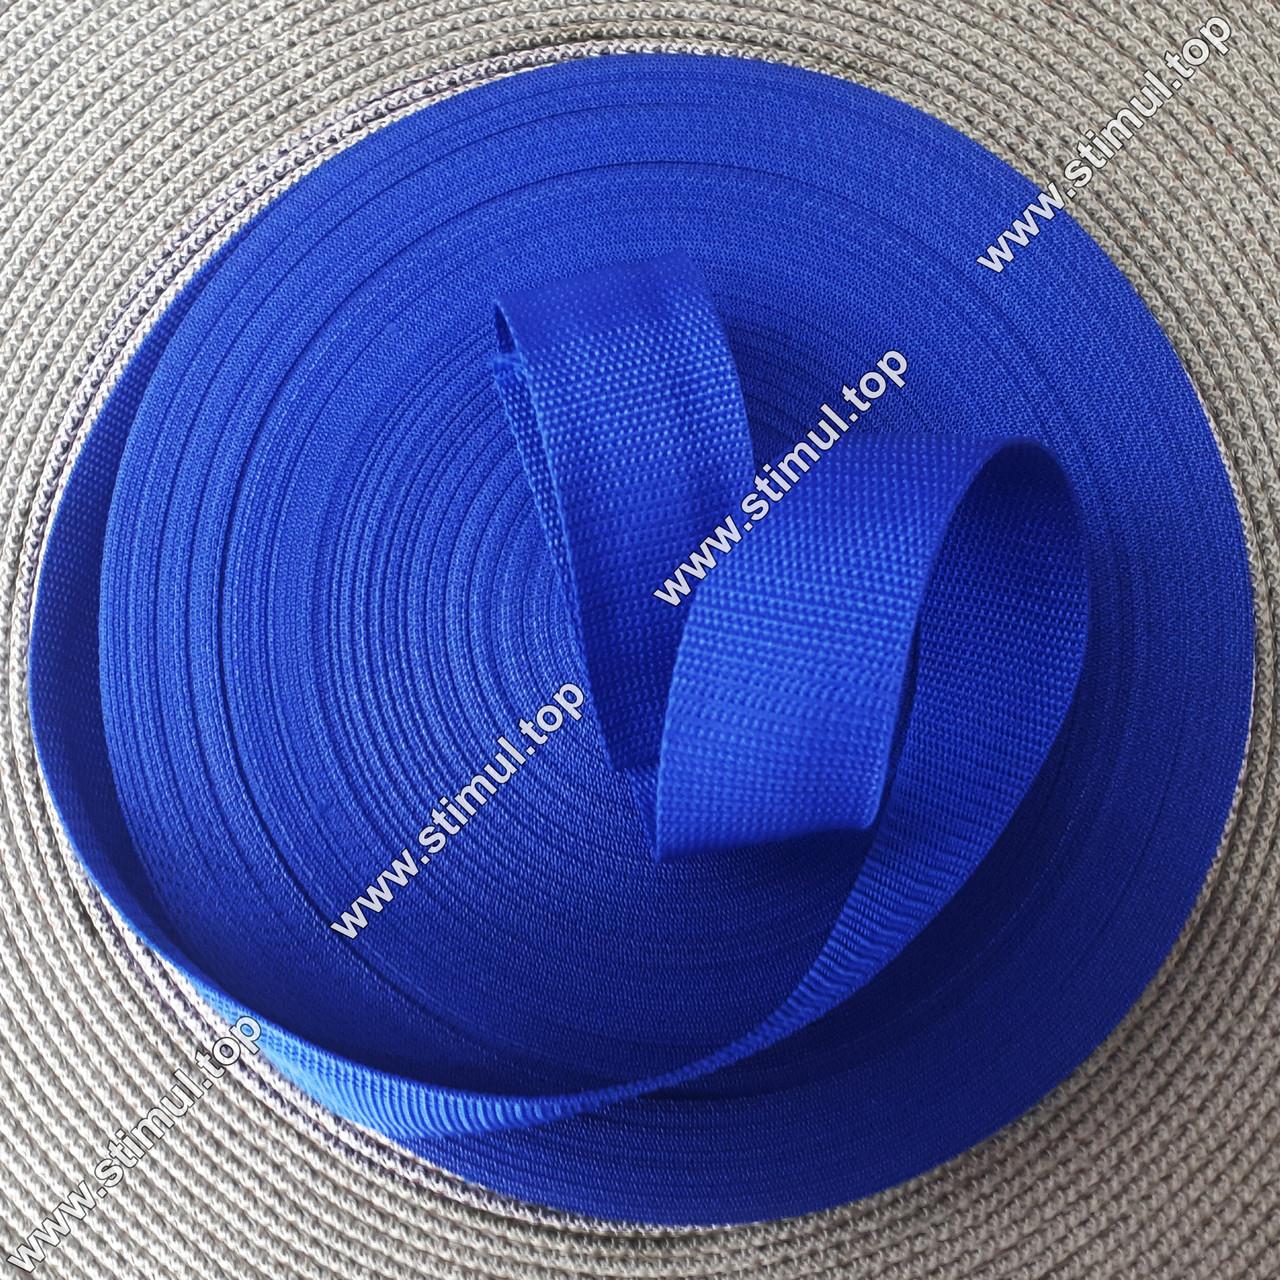 Тесьма цветная 25 мм (бухта 50 м) ЭЛЕКТРИК / Стропа сумочная ременная / Лента для рюкзаков / Стрічка ремінна